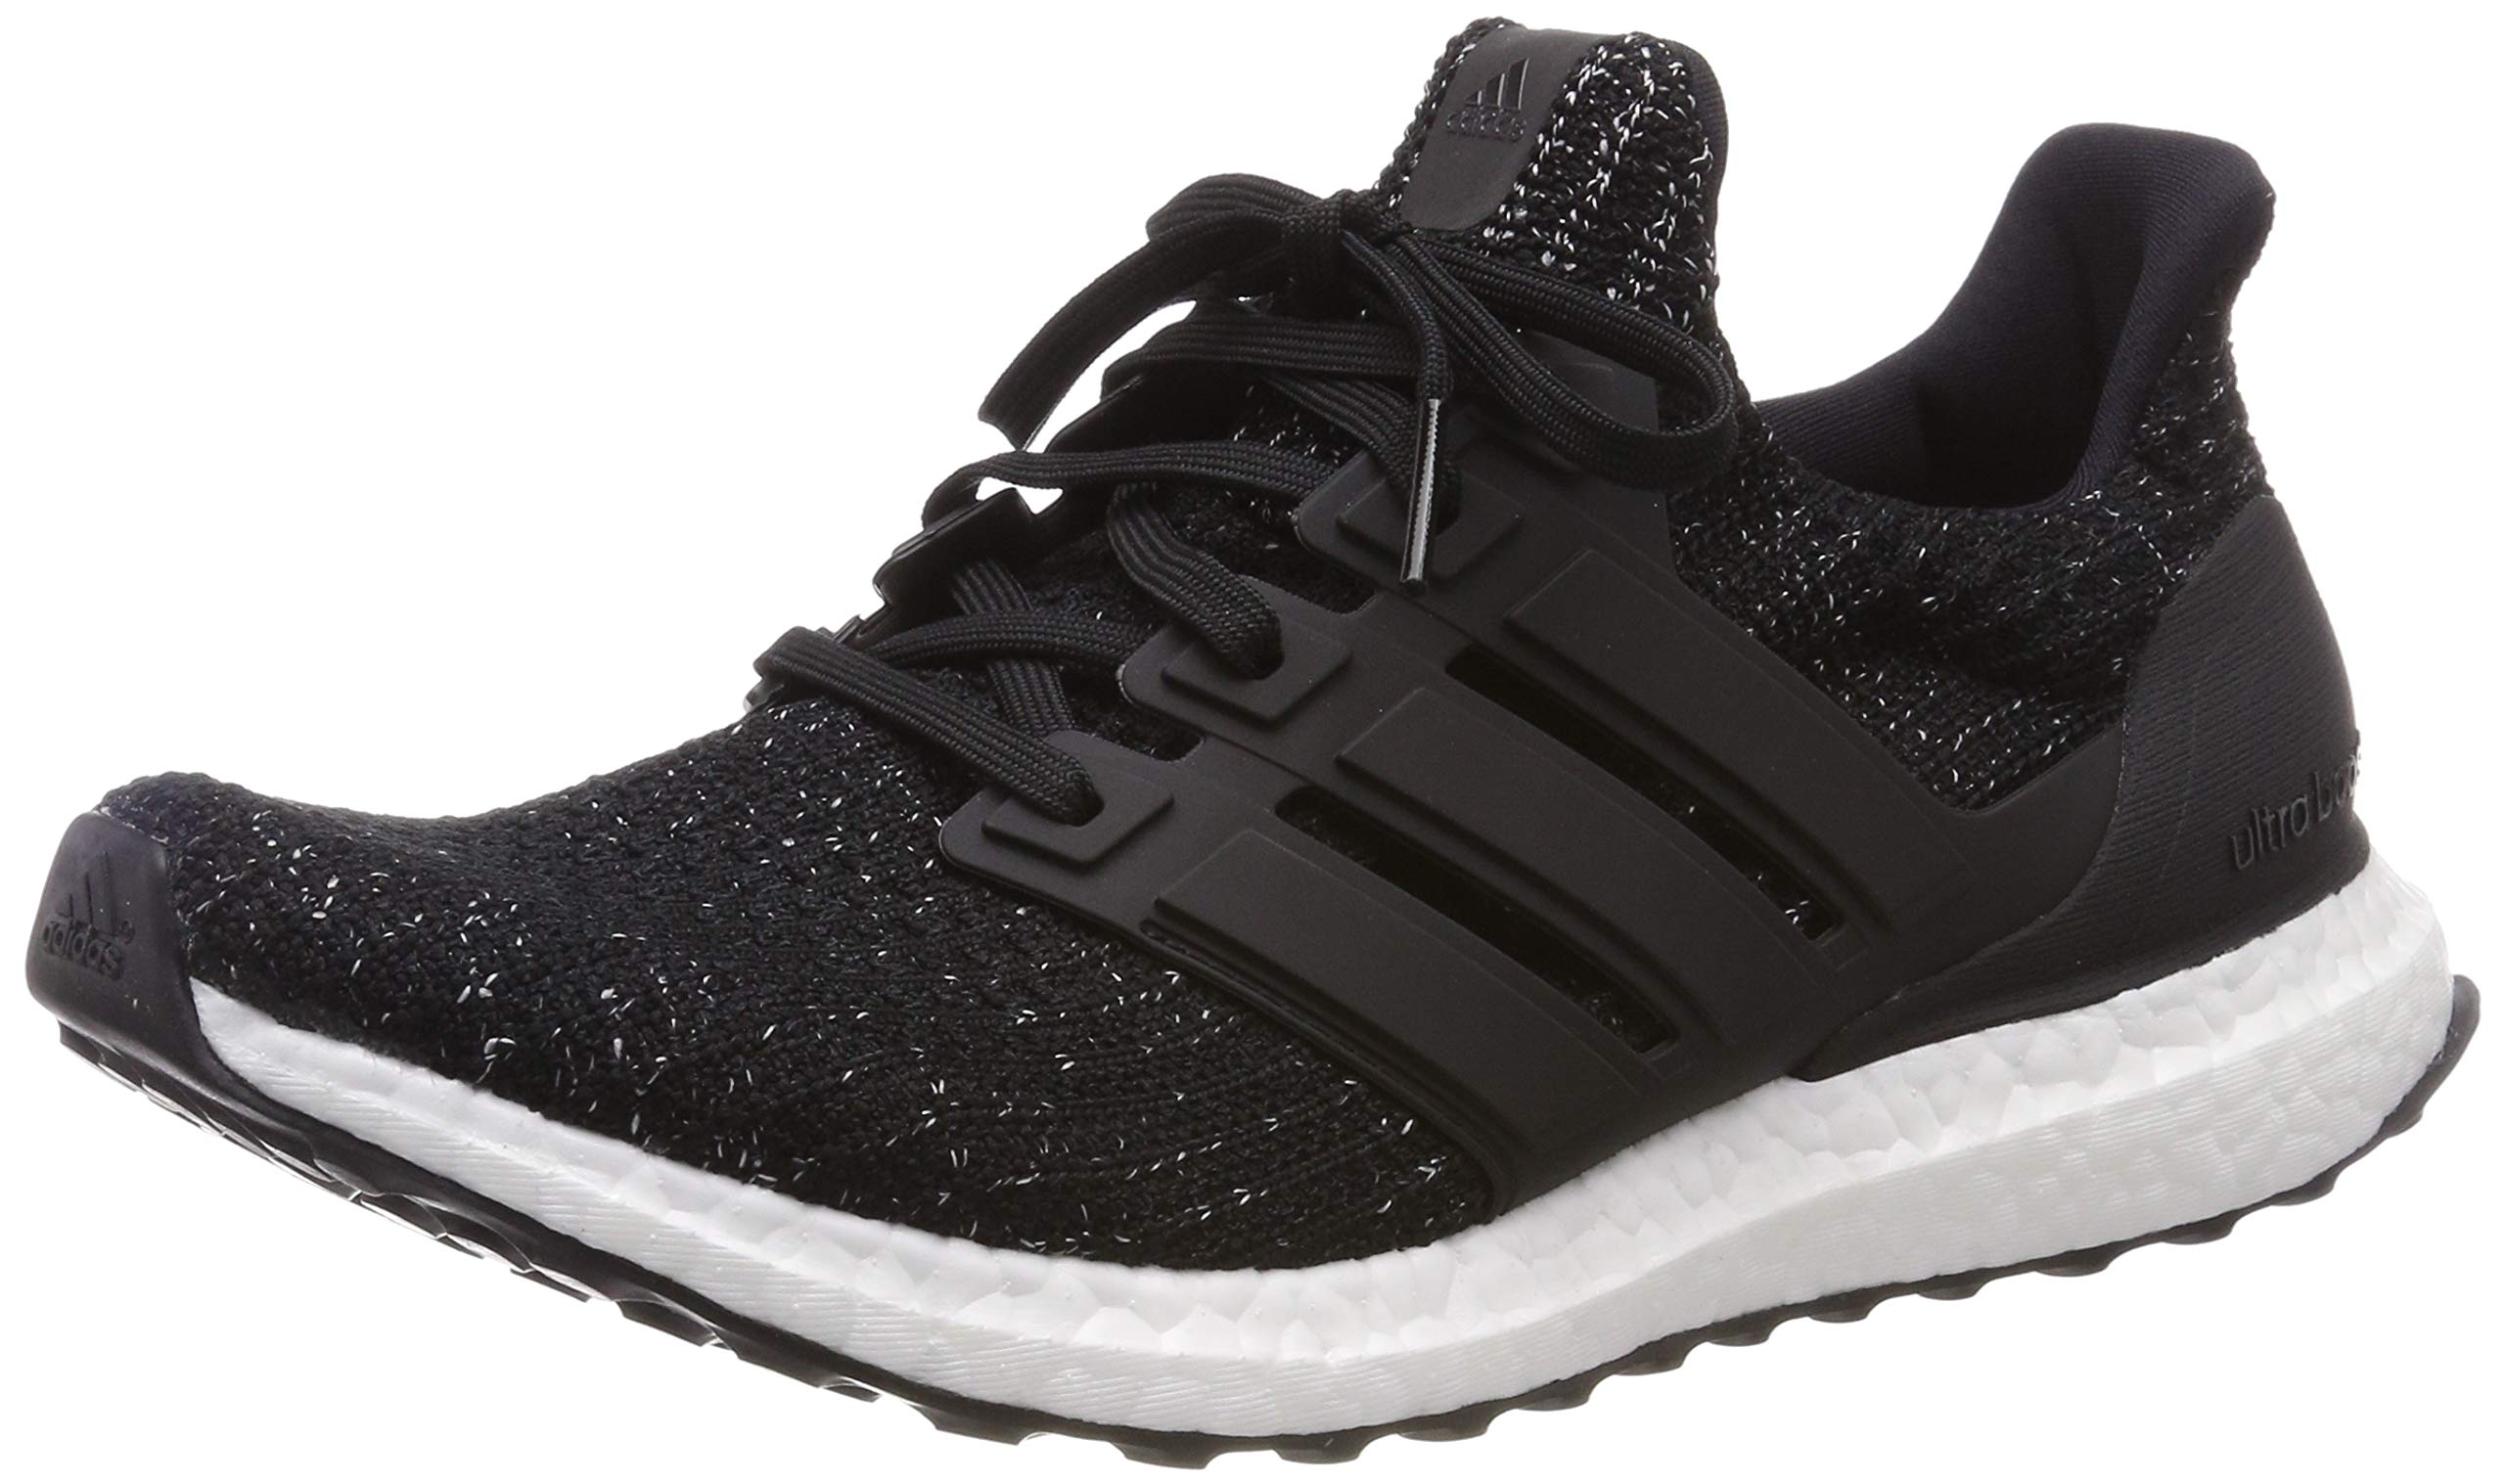 0ebfa88236b Adidas Ultra Boost 4.0 Size 11 Top Deals   Lowest Price ...